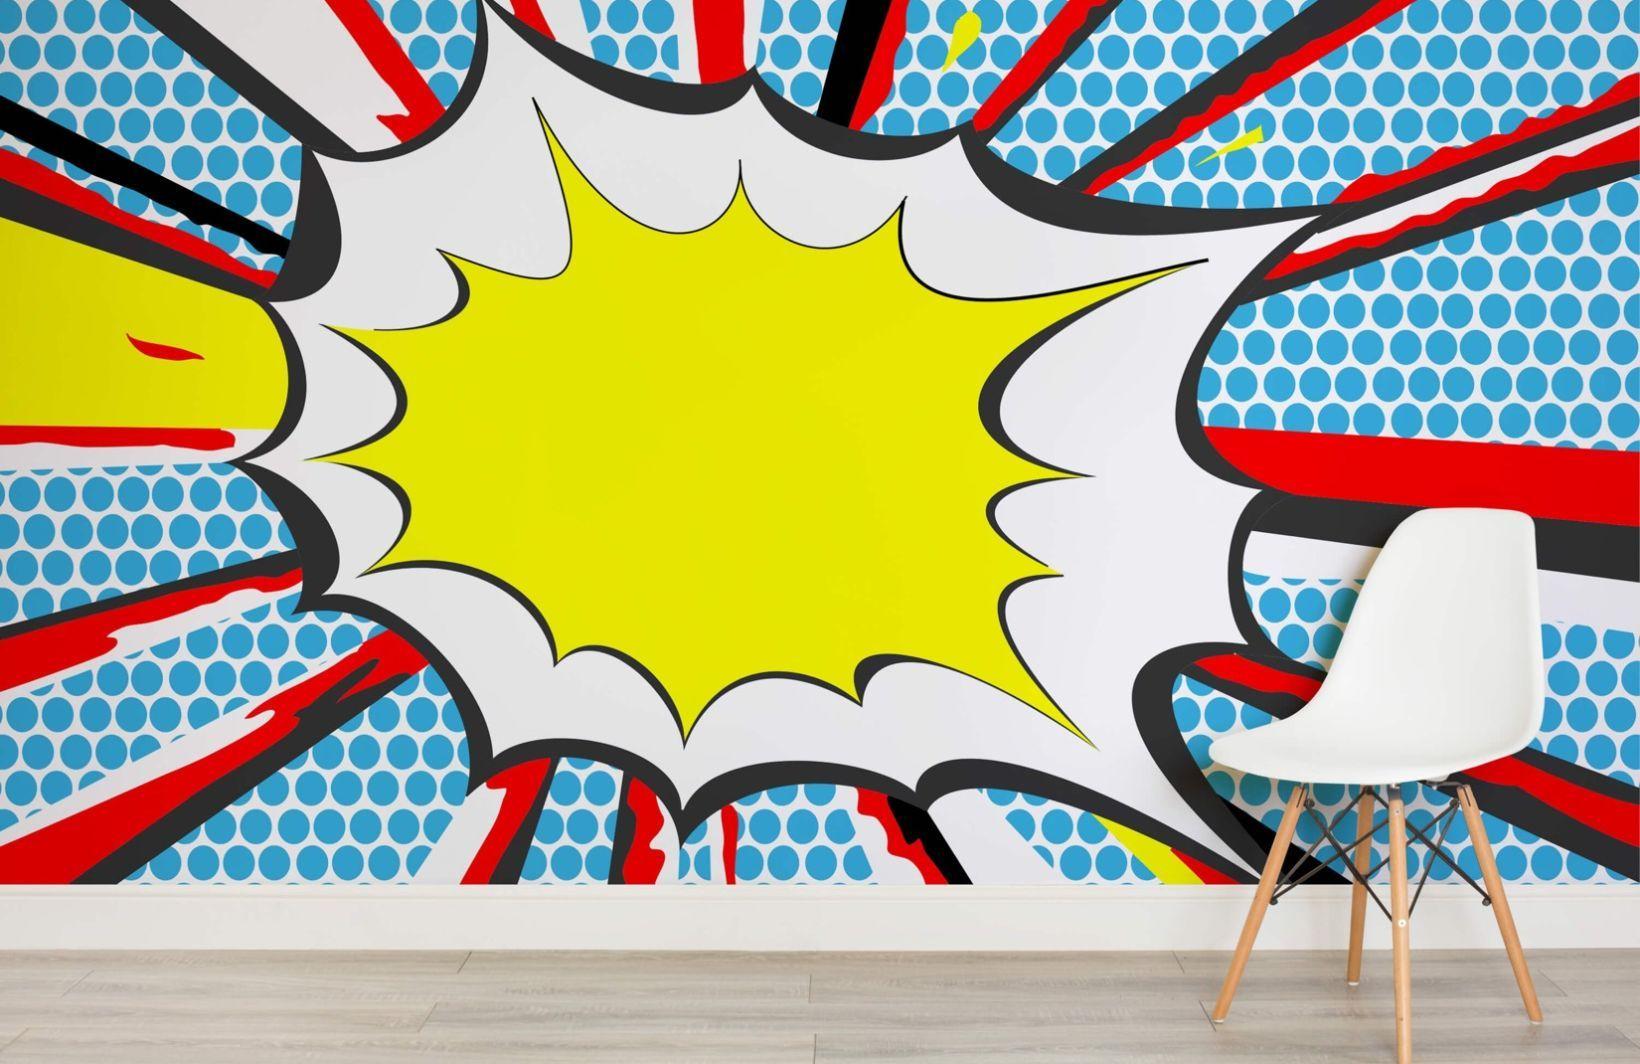 BANG Pop Art Wallpaper Wall Mural | MuralsWallpaper.co.uk | Retro ...